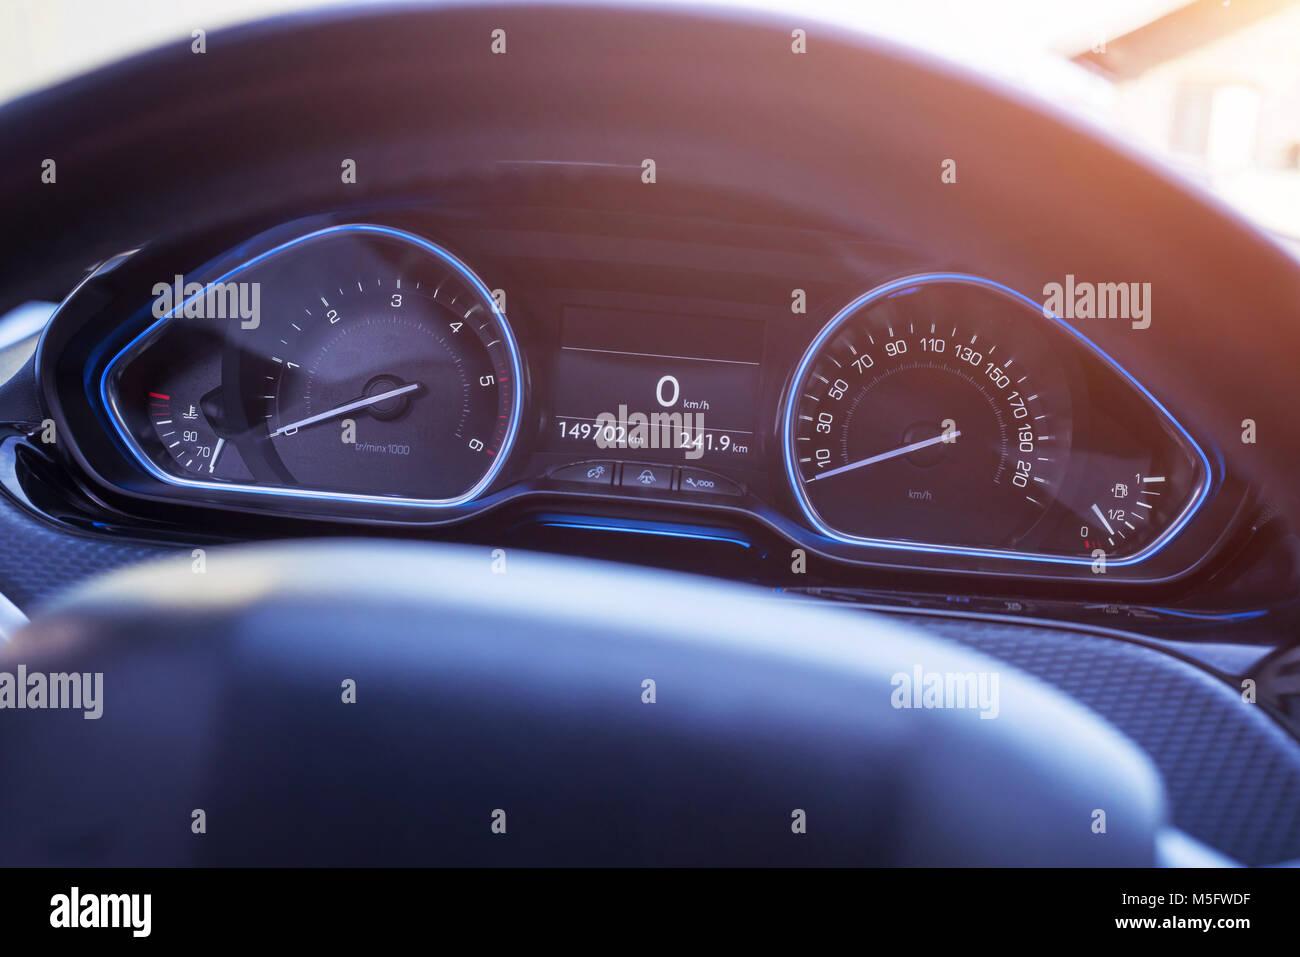 car speedometer with blue led light modern car interior stock photo 175526219 alamy. Black Bedroom Furniture Sets. Home Design Ideas